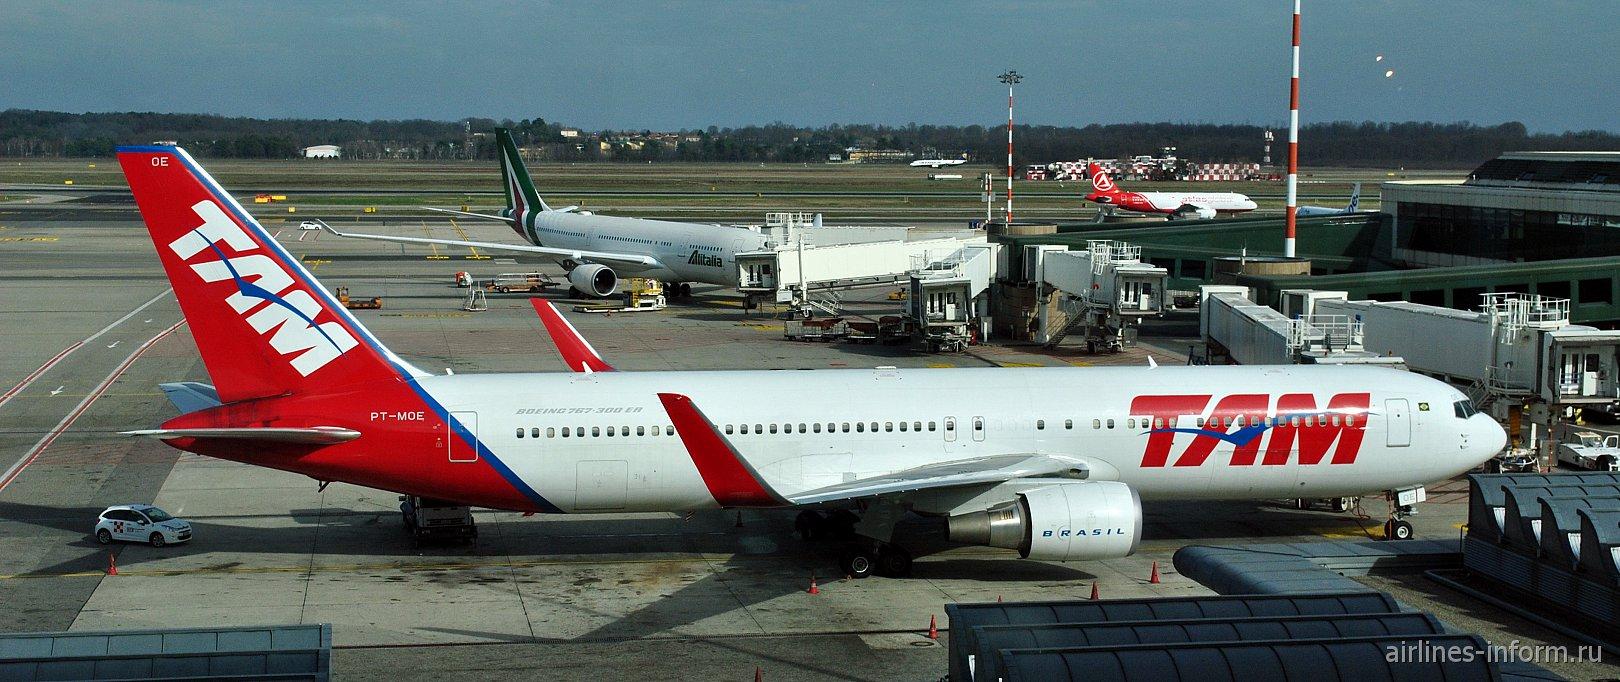 """Constellation Dreamer"": Сан-Паулу Гуарульос (GRU/T3) - Милан Мальпенса (MXP/T1) LATAM Brasil LA8062 (JJ8062) на Boeing 767-300ER(WL)"